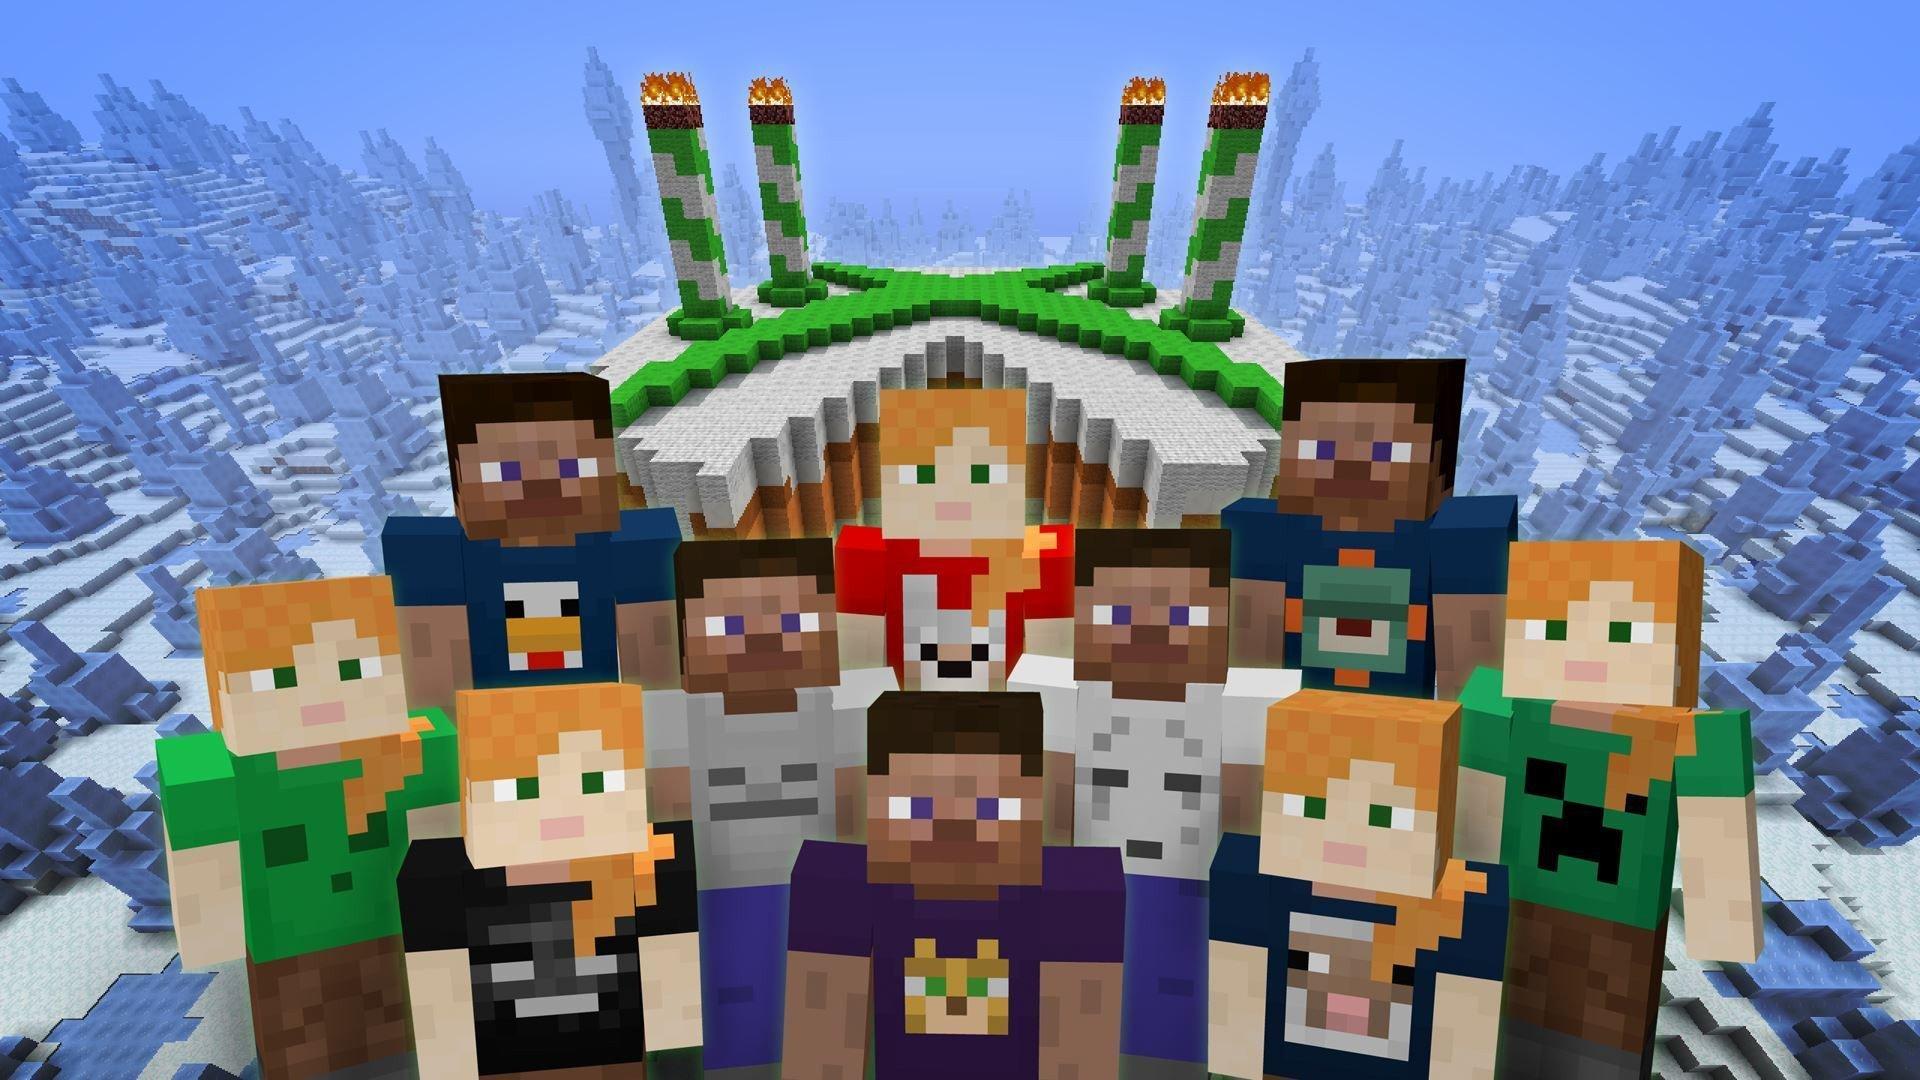 Minecraft Happy Birthday Images Happy Birthday Minecraft Gimme some Skin